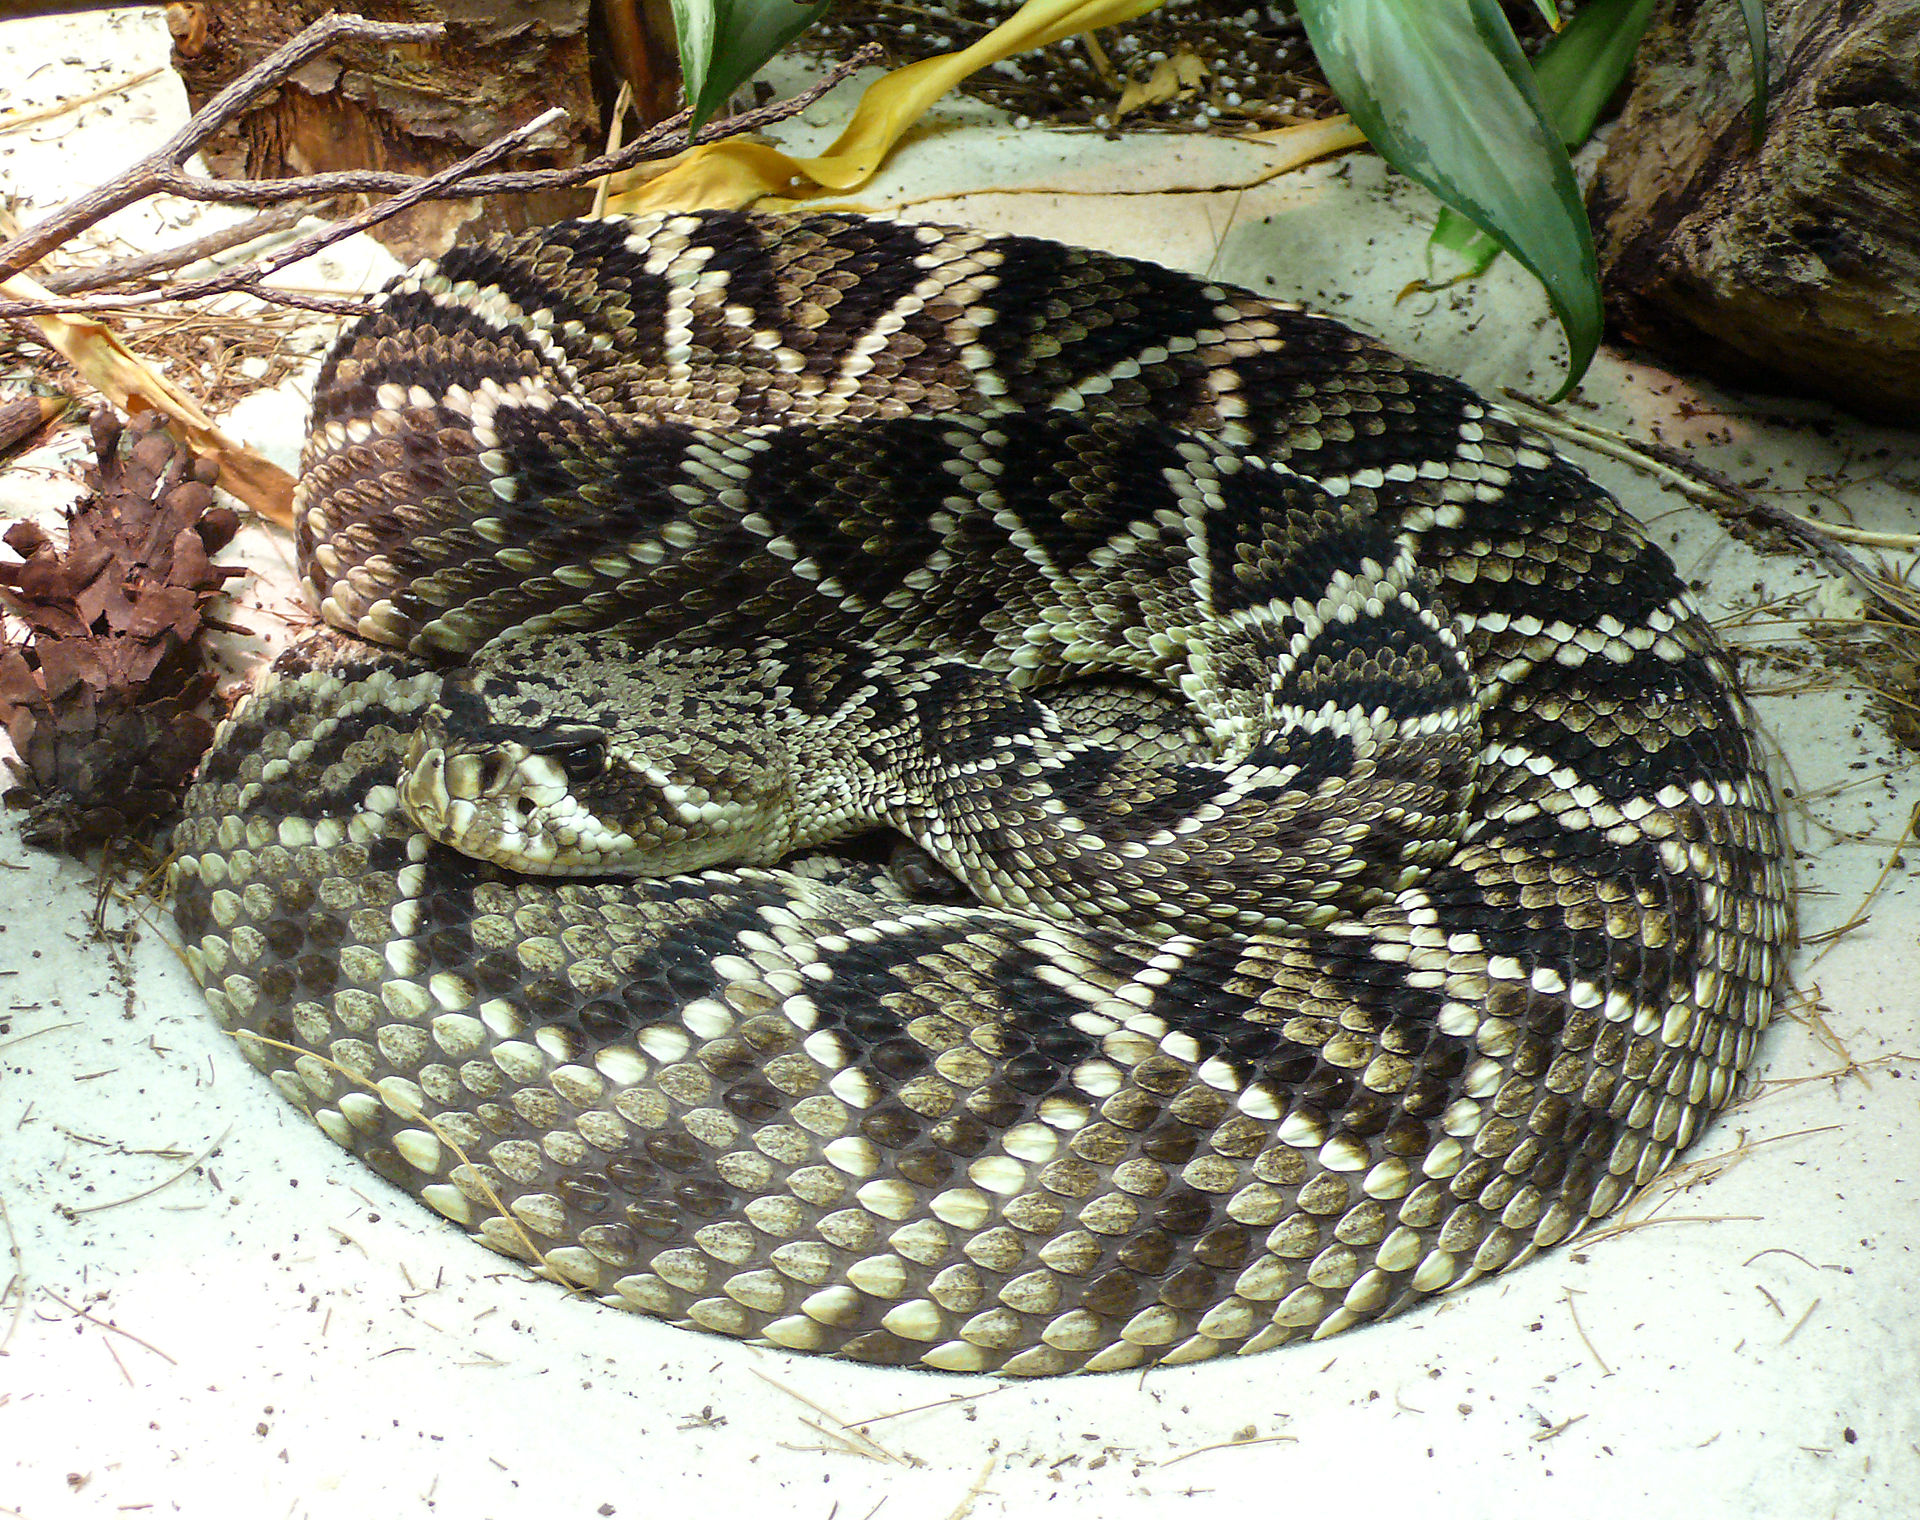 Eastern Diamondback Rattlesnake